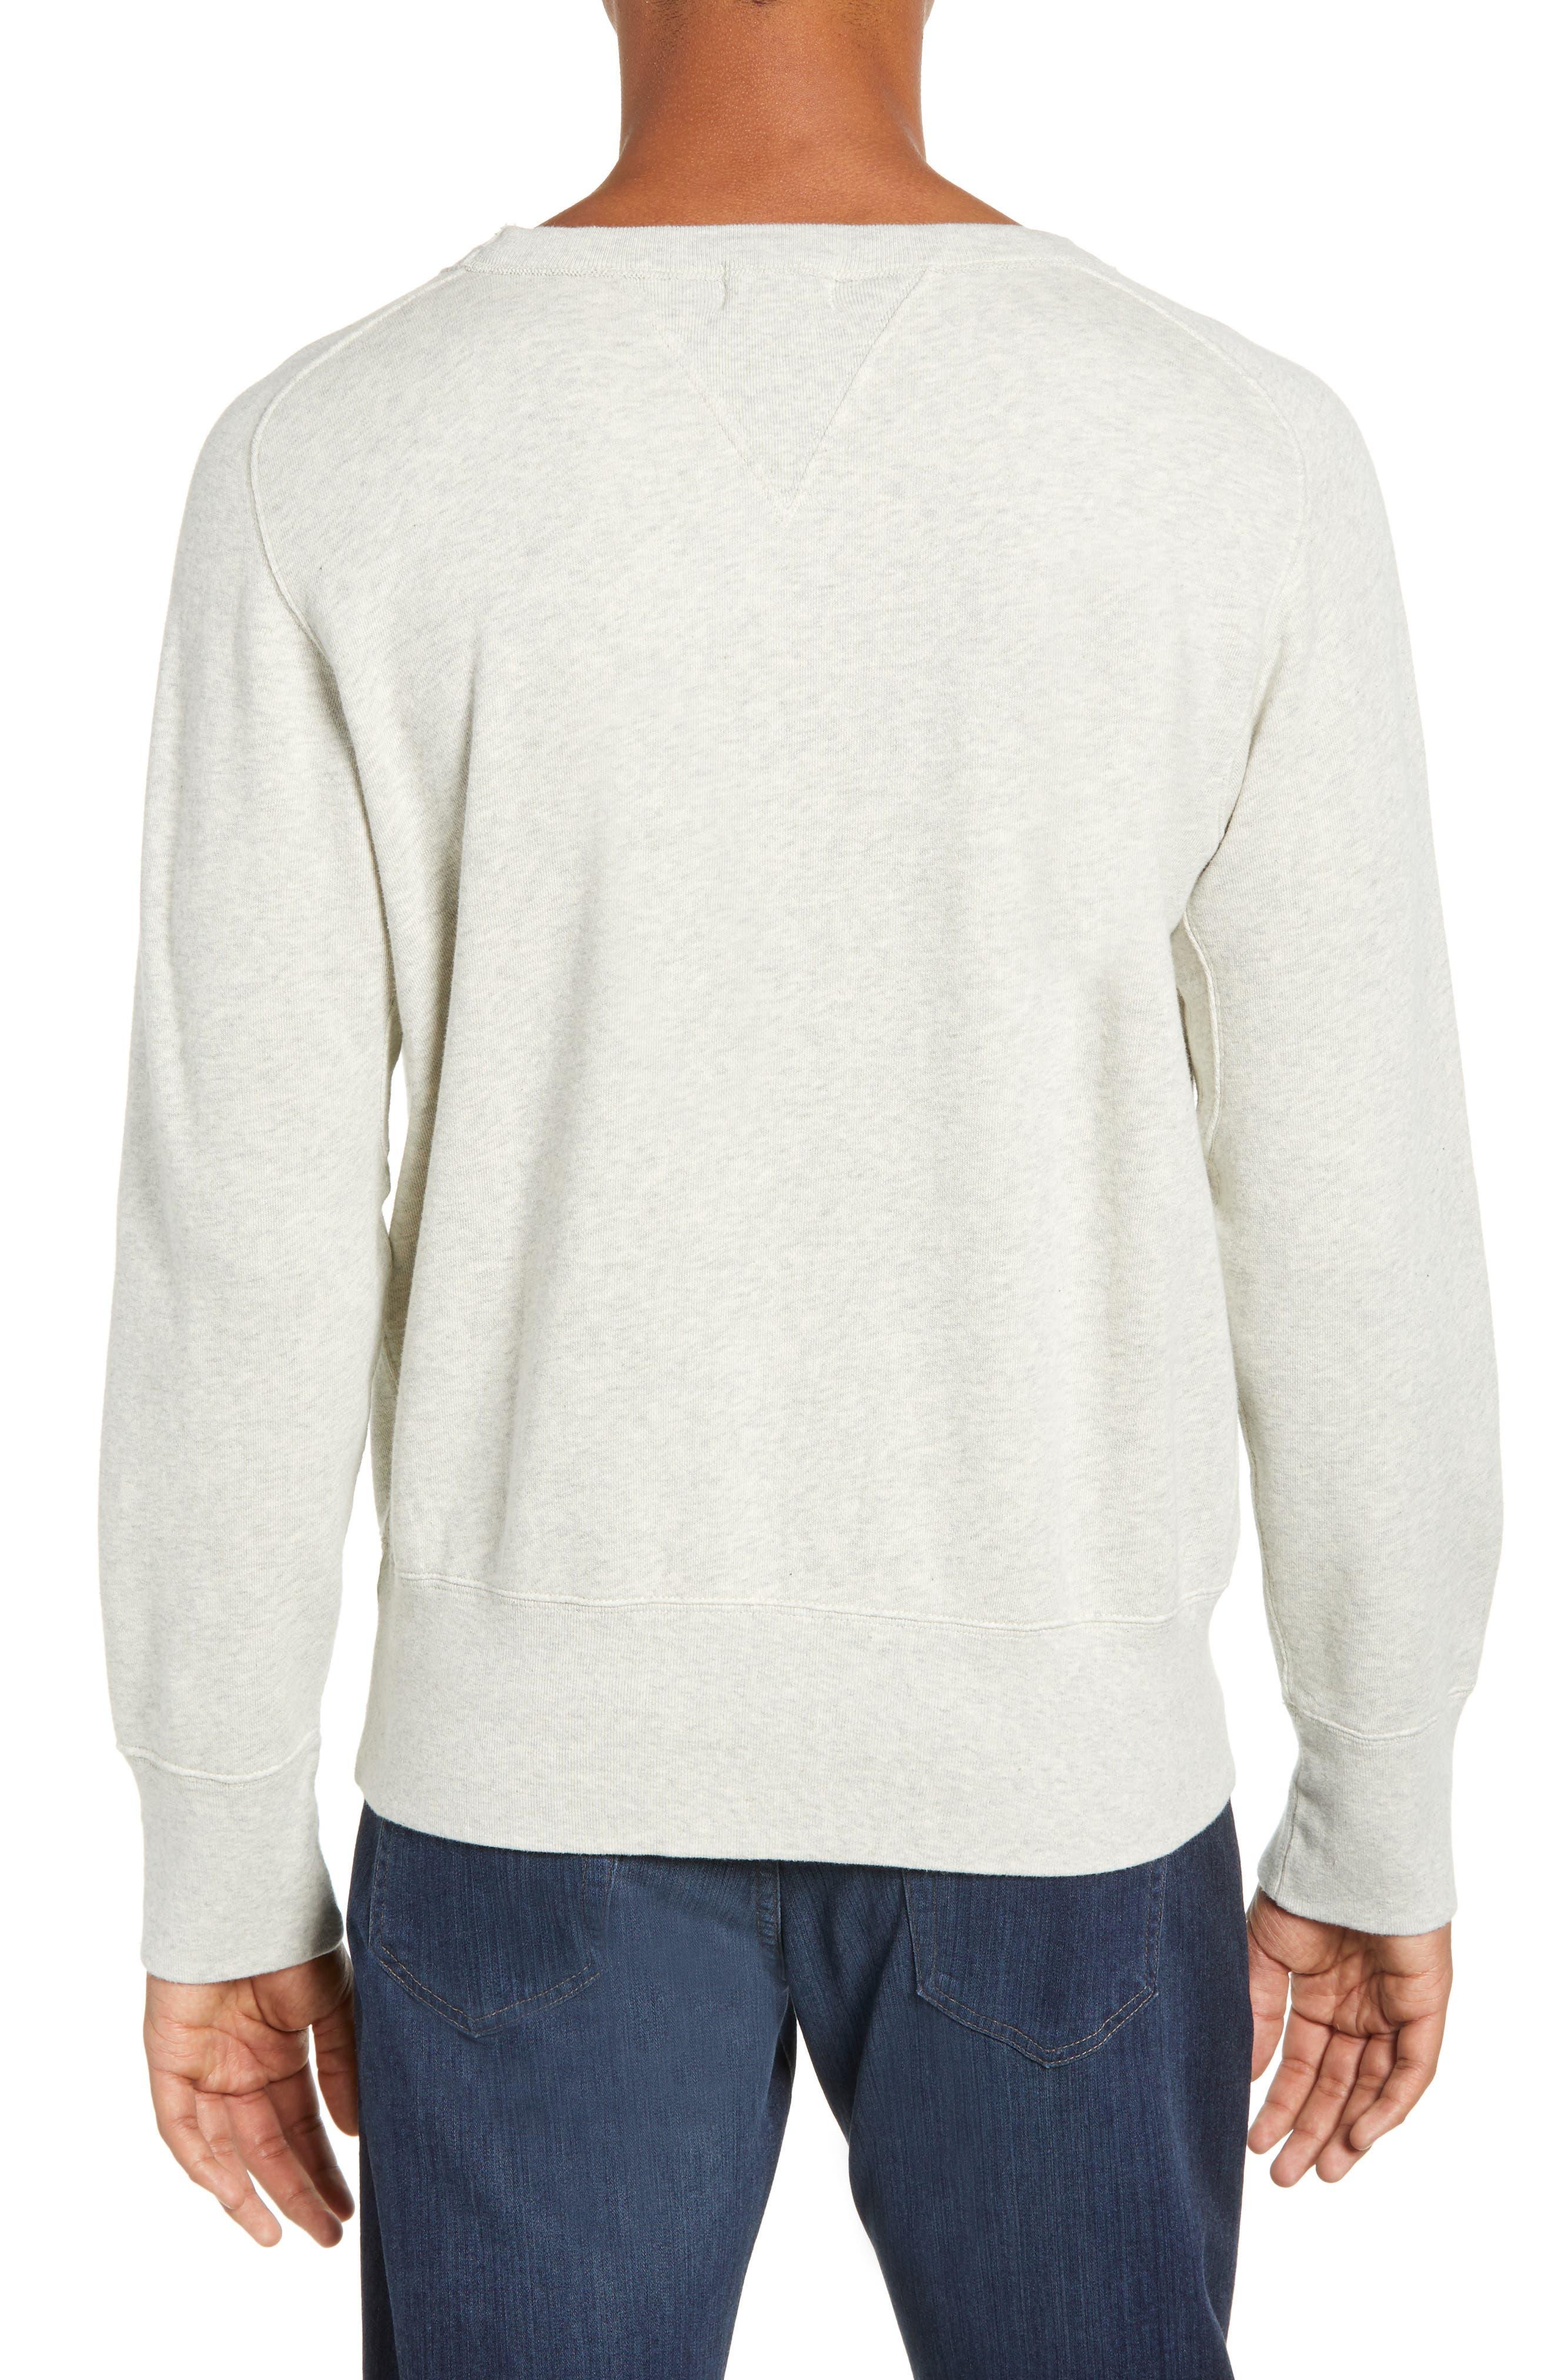 LEVI'S<SUP>®</SUP> VINTAGE CLOTHING, 1930s Bay Meadows Sweatshirt, Alternate thumbnail 2, color, OATMEAL